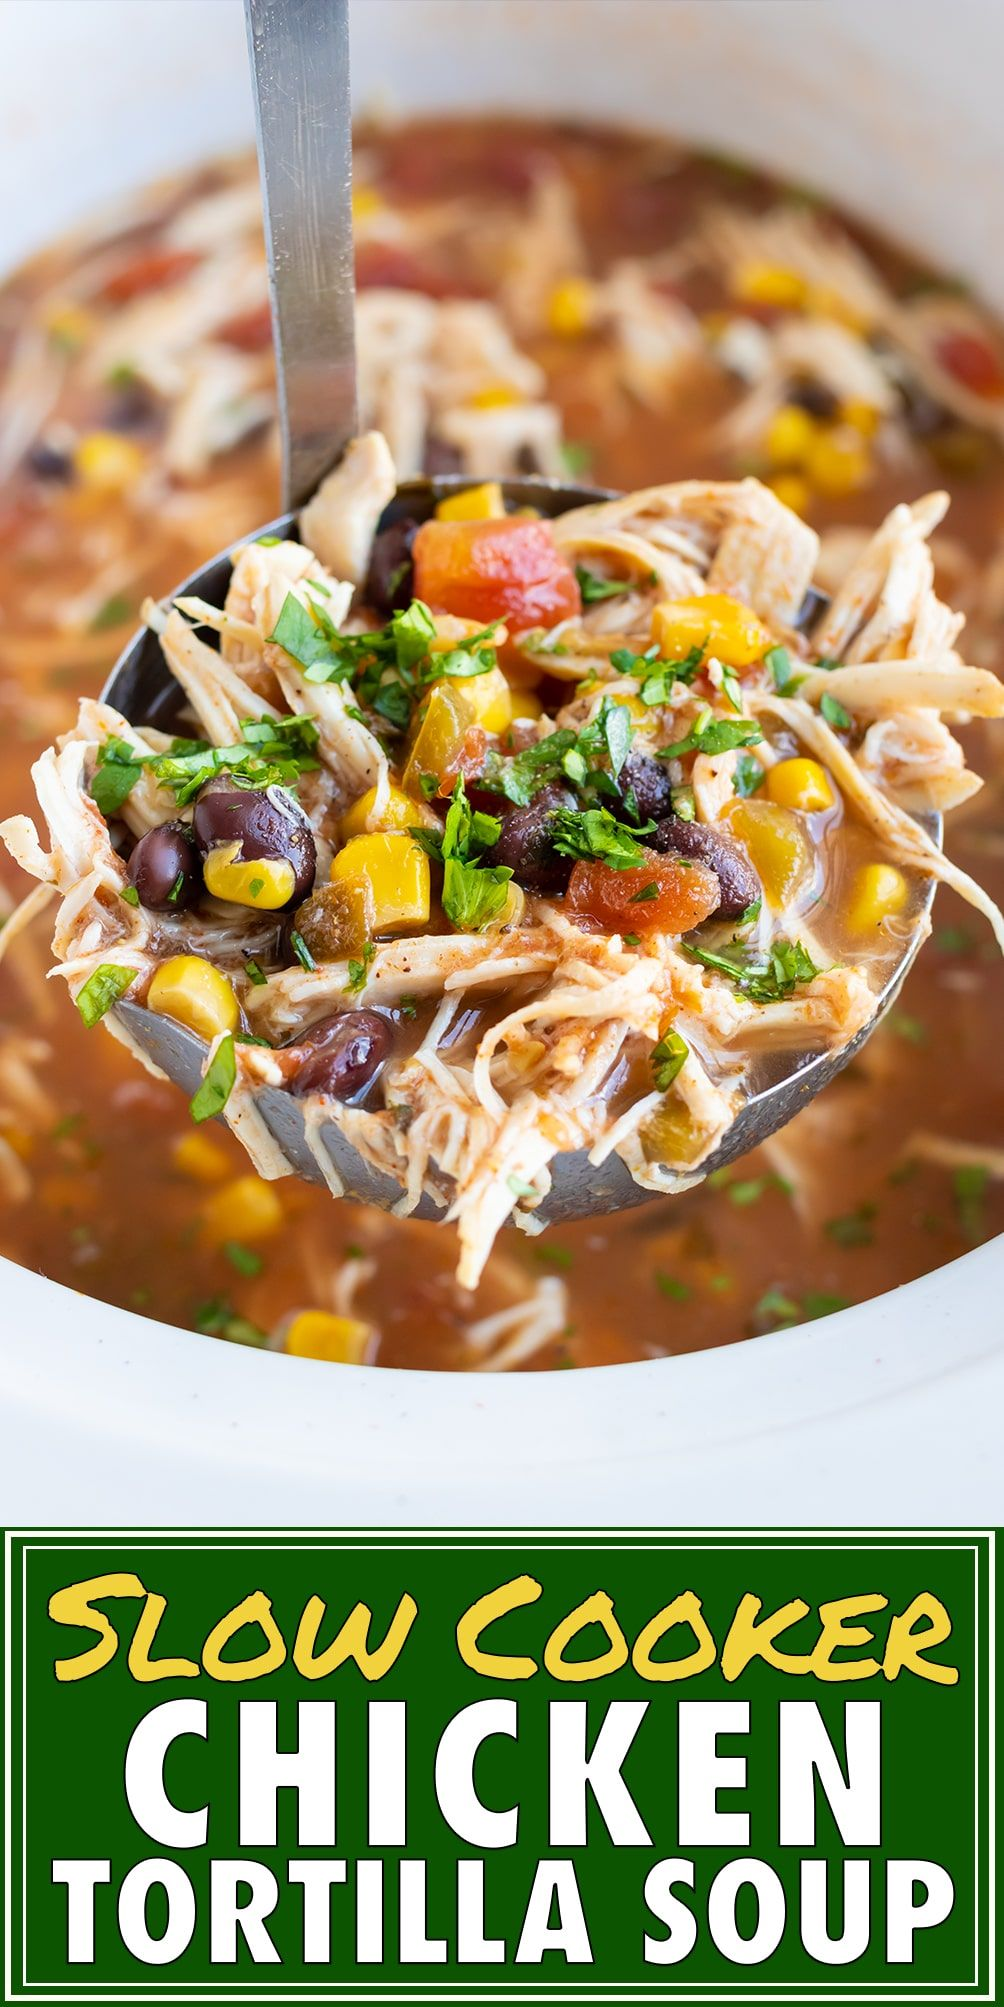 Easy Slow Cooker Chicken Tortilla Soup #slowcookercrockpots